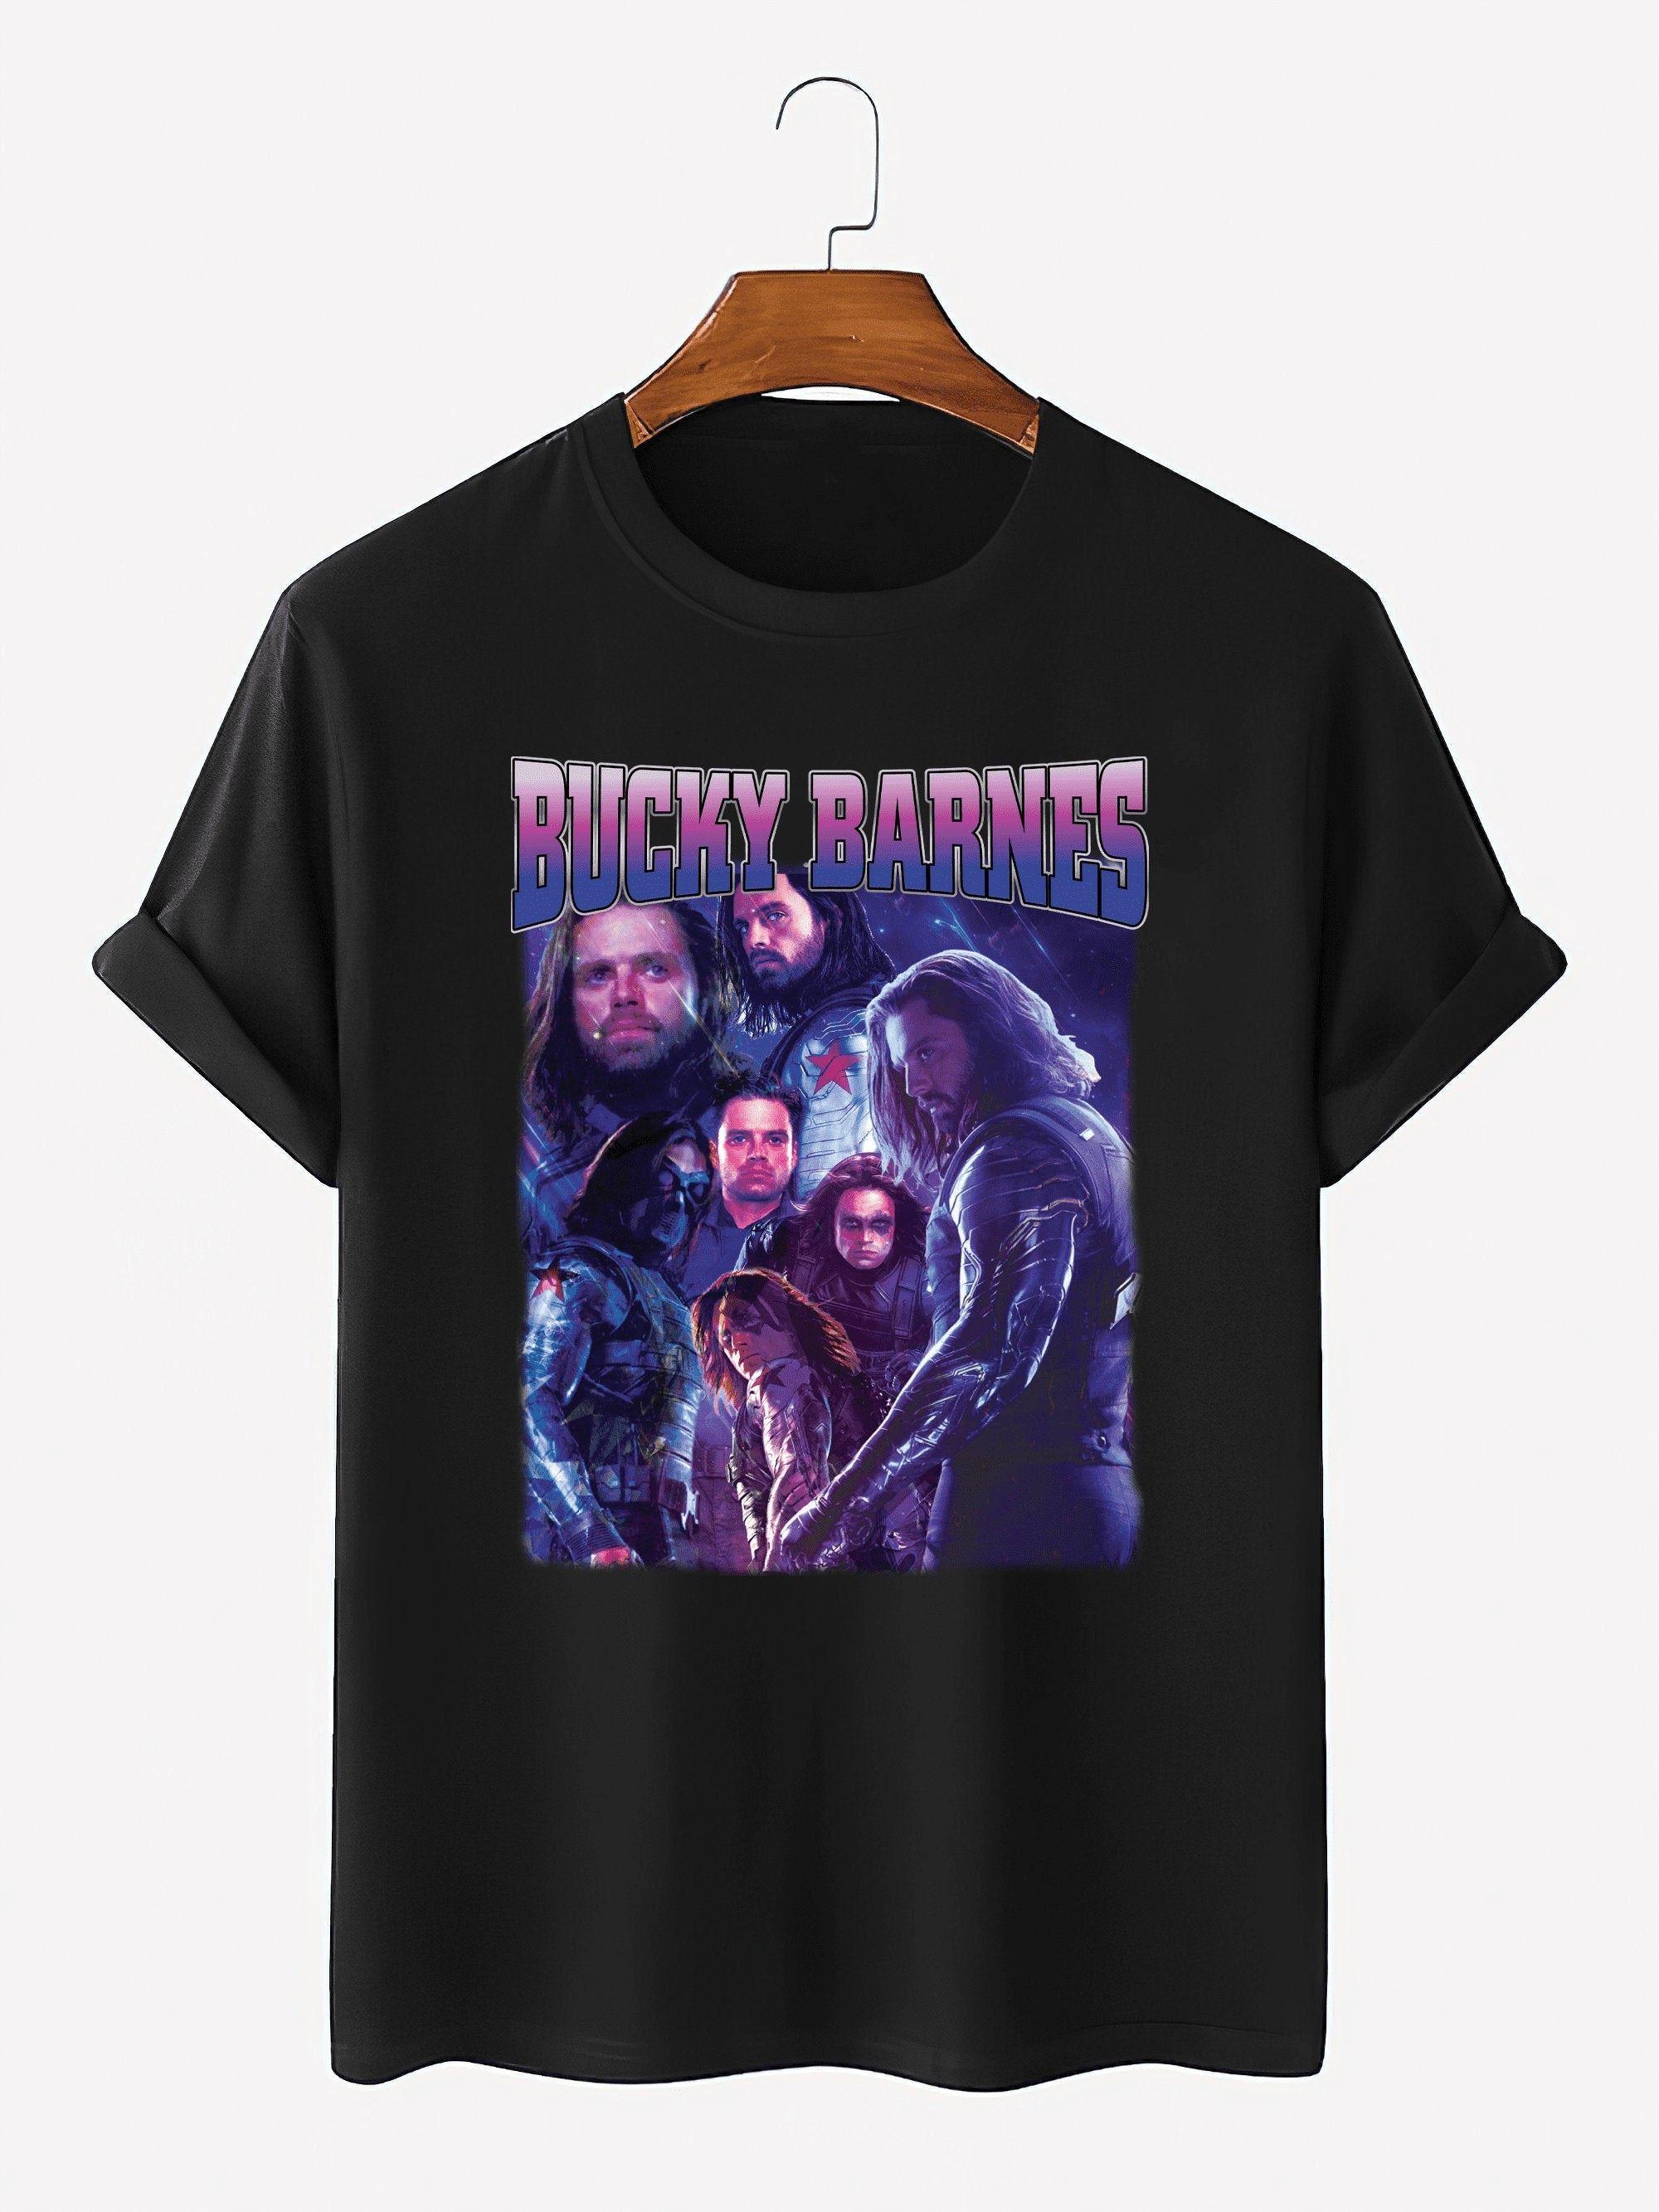 Bucky Barnes Vintage Retro 90s Tshirt The Falcon And Winter Soldier Homage T-shirt Soldier Homage Tv Series Sweatshirt Hoodie